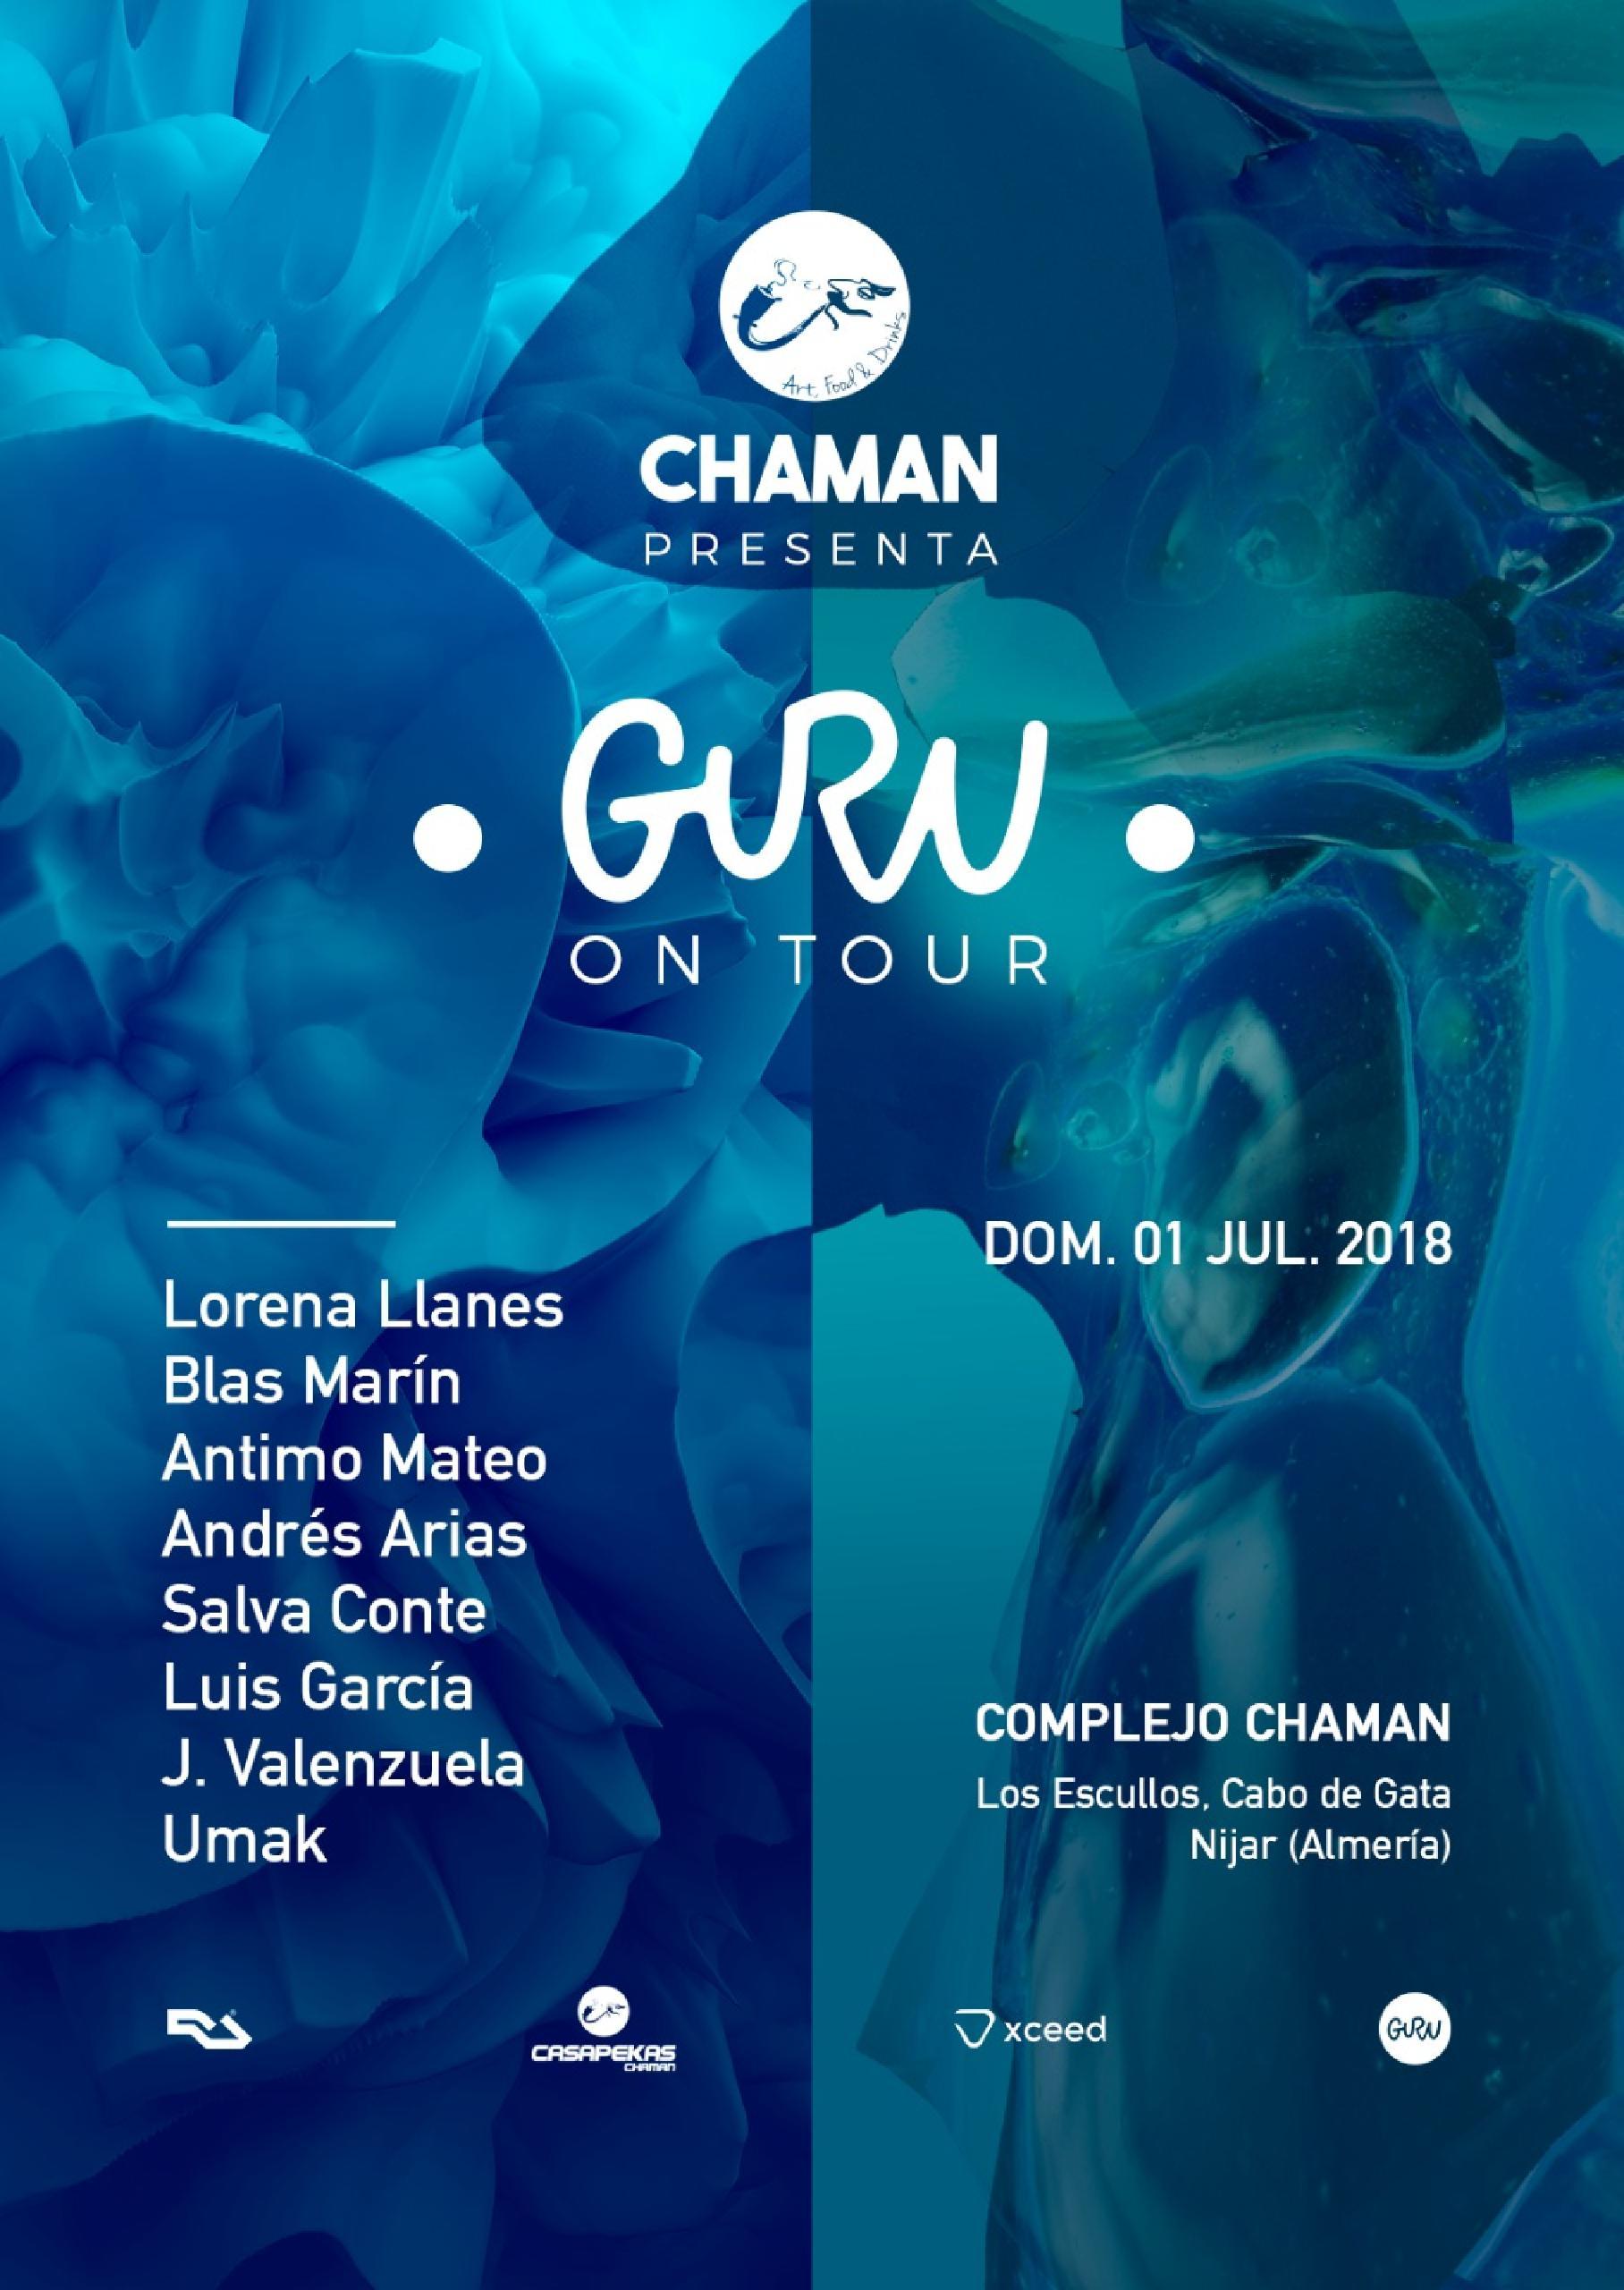 chaman guru on tour